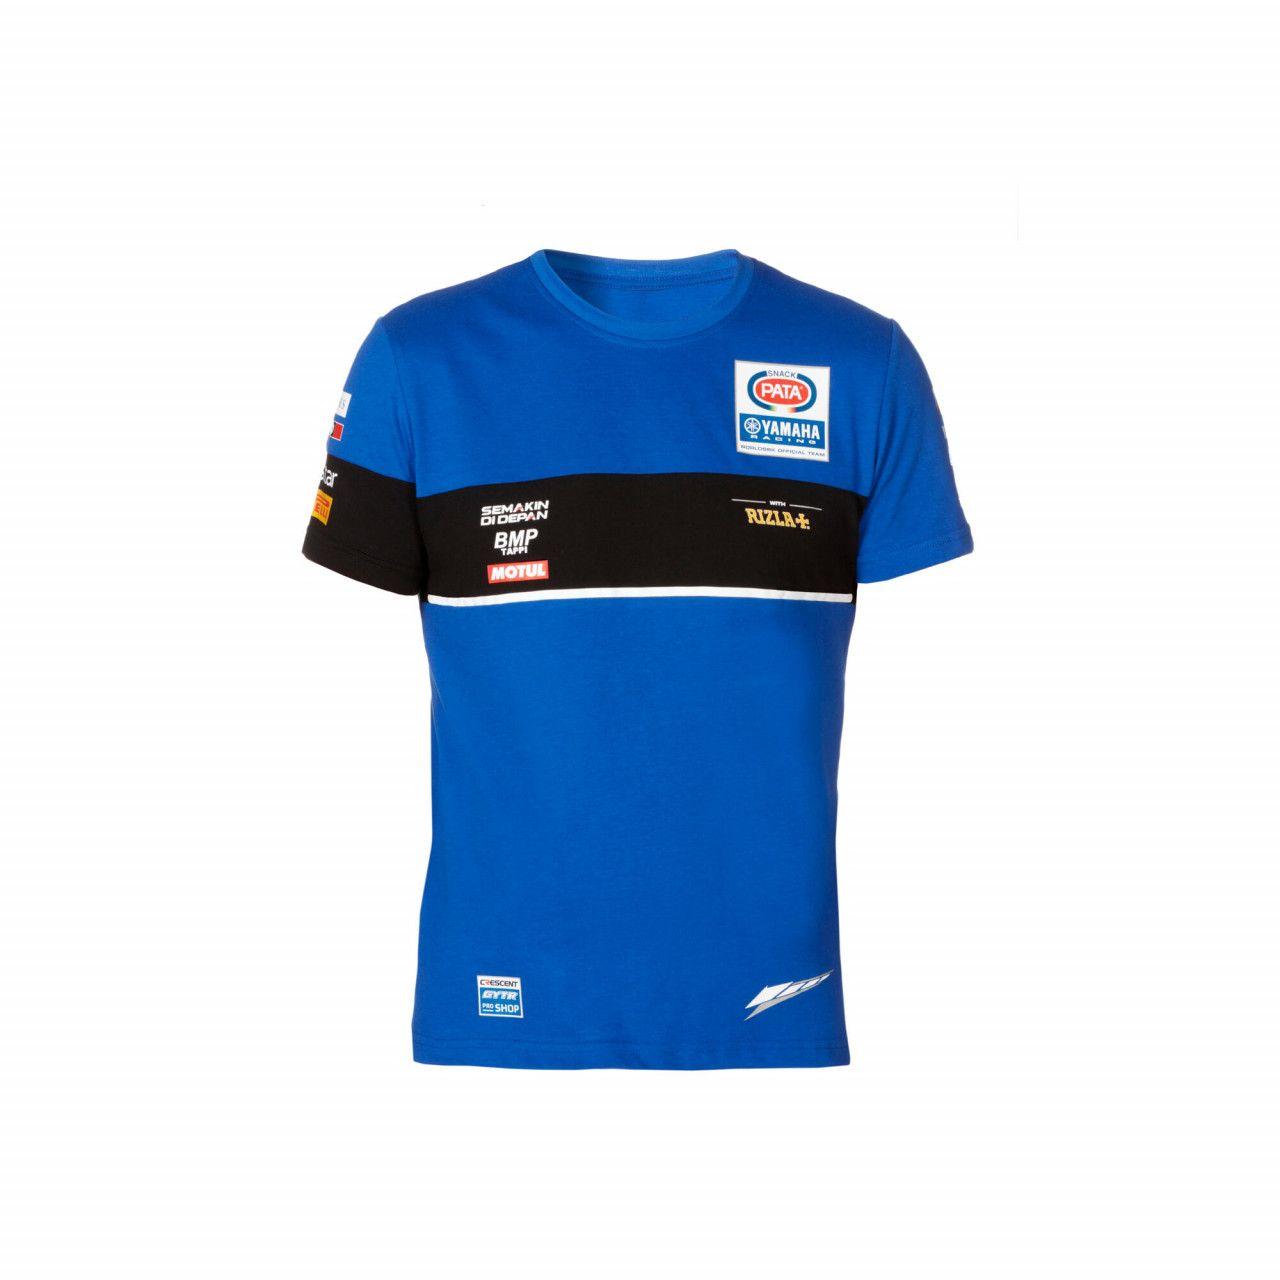 YAMAHA T-shirt officiel homme de l'équipe Pata en WorldSBK 2020